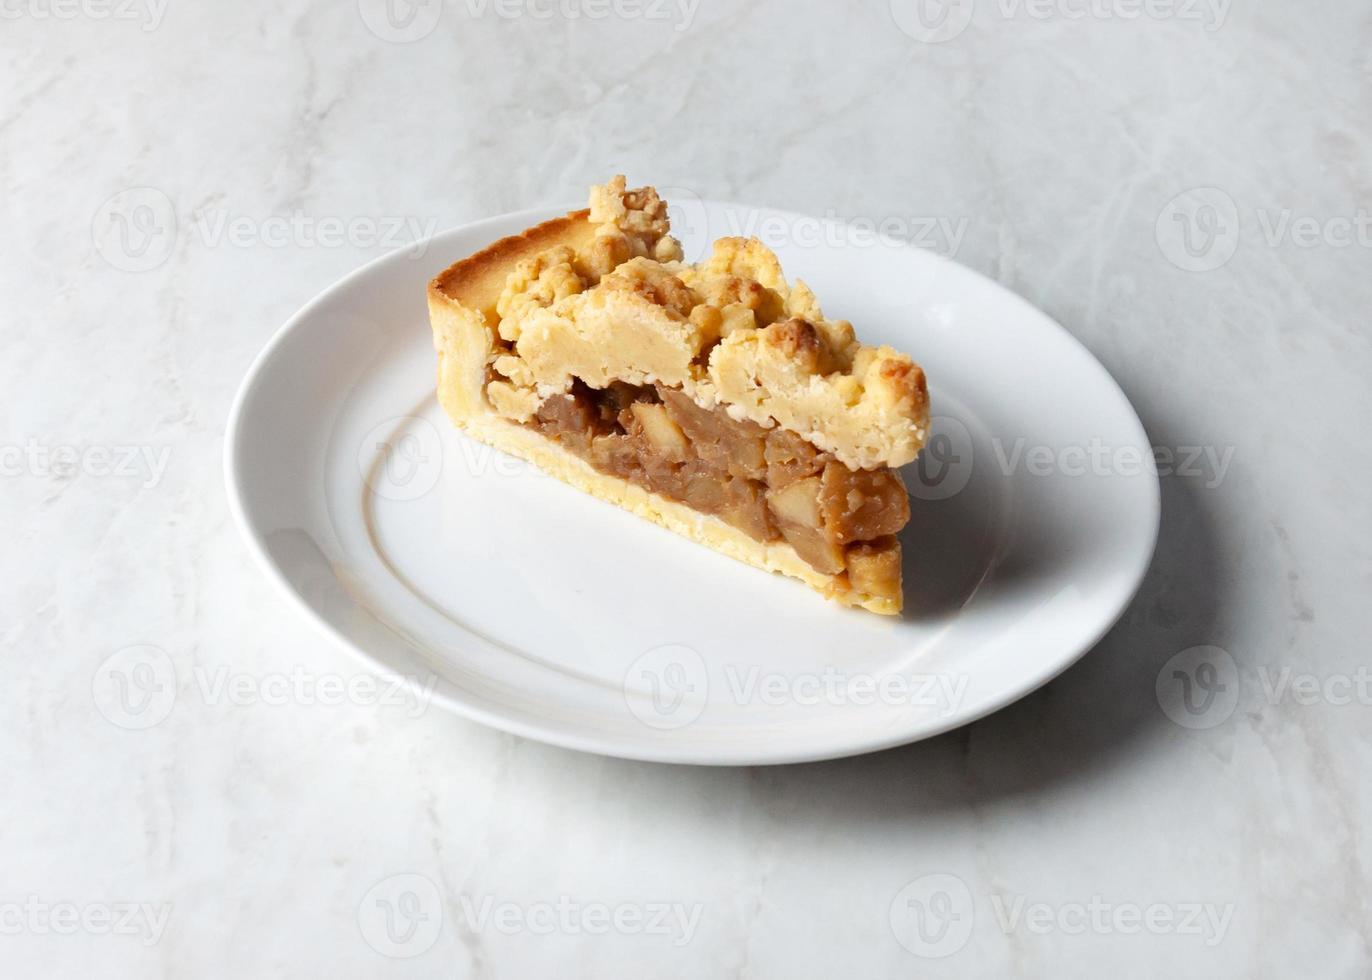 delicioso bolo de maçã crumble em um prato branco foto